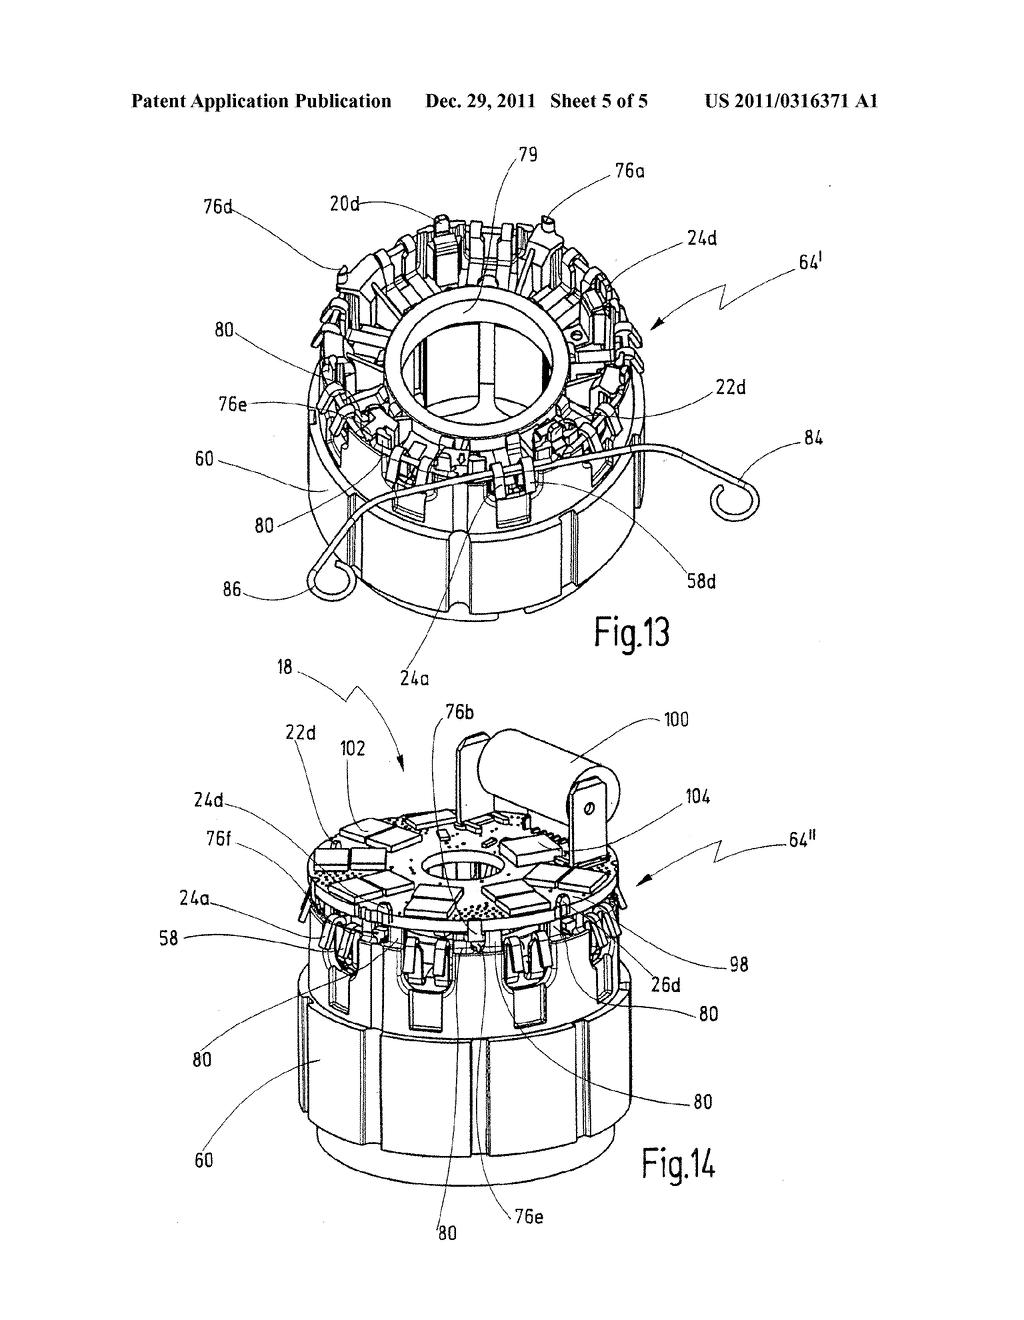 Control Wiring Diagram Of Dol Starter. Control. Wiring